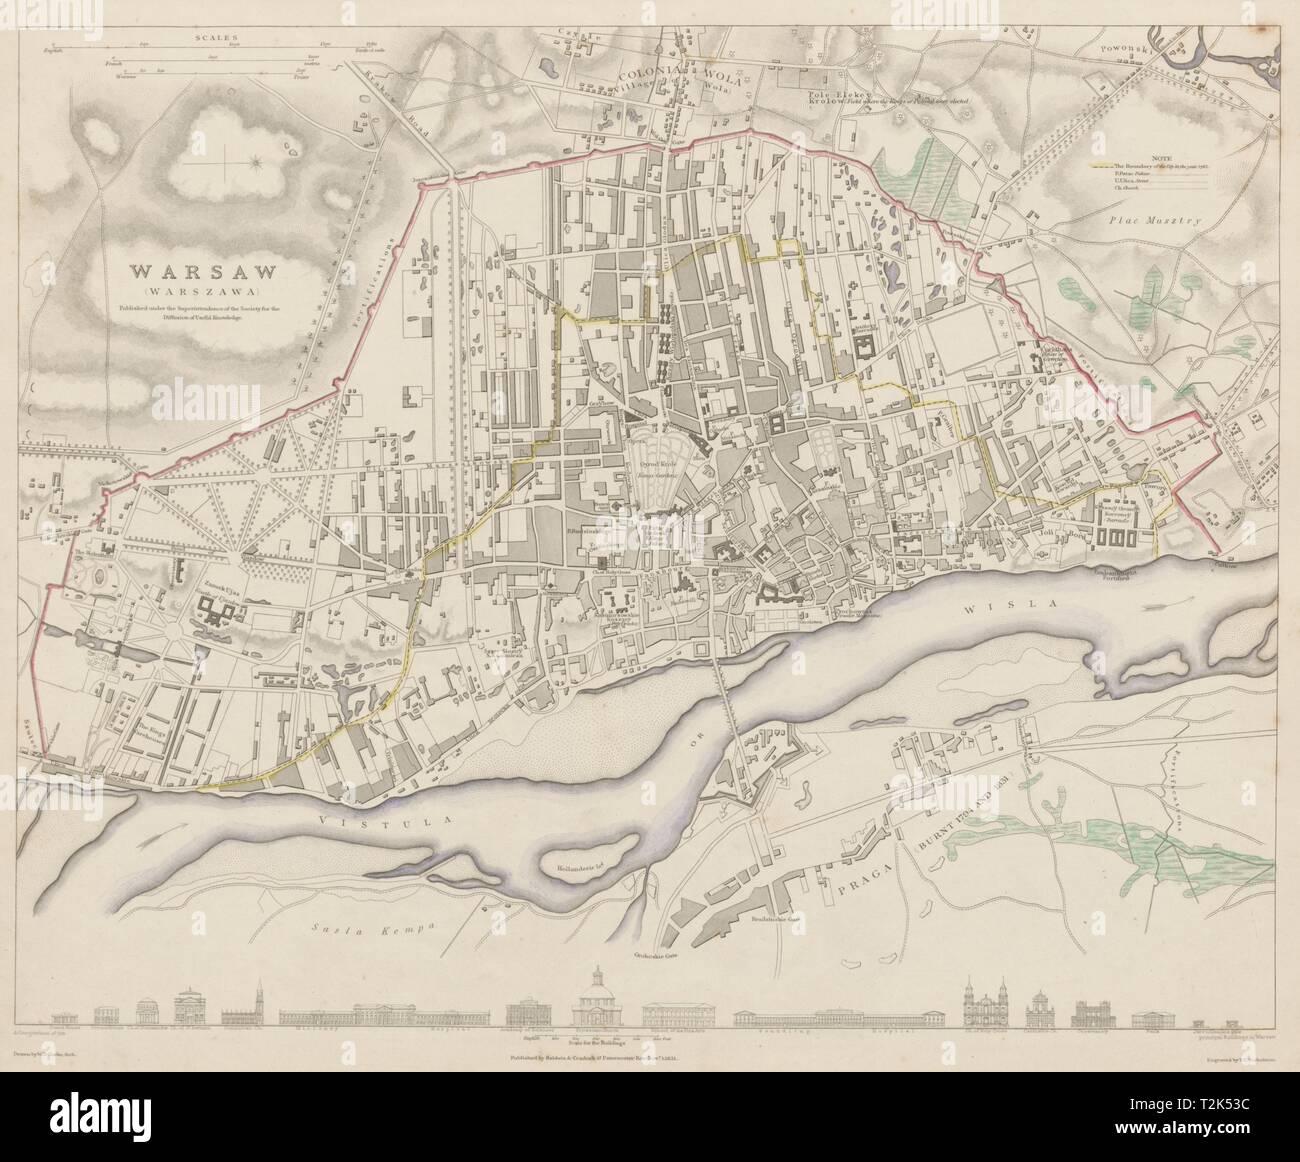 WARSAW WARSZAWA antique town city map plan. Building profiles.Colour SDUK 1844 Stock Photo